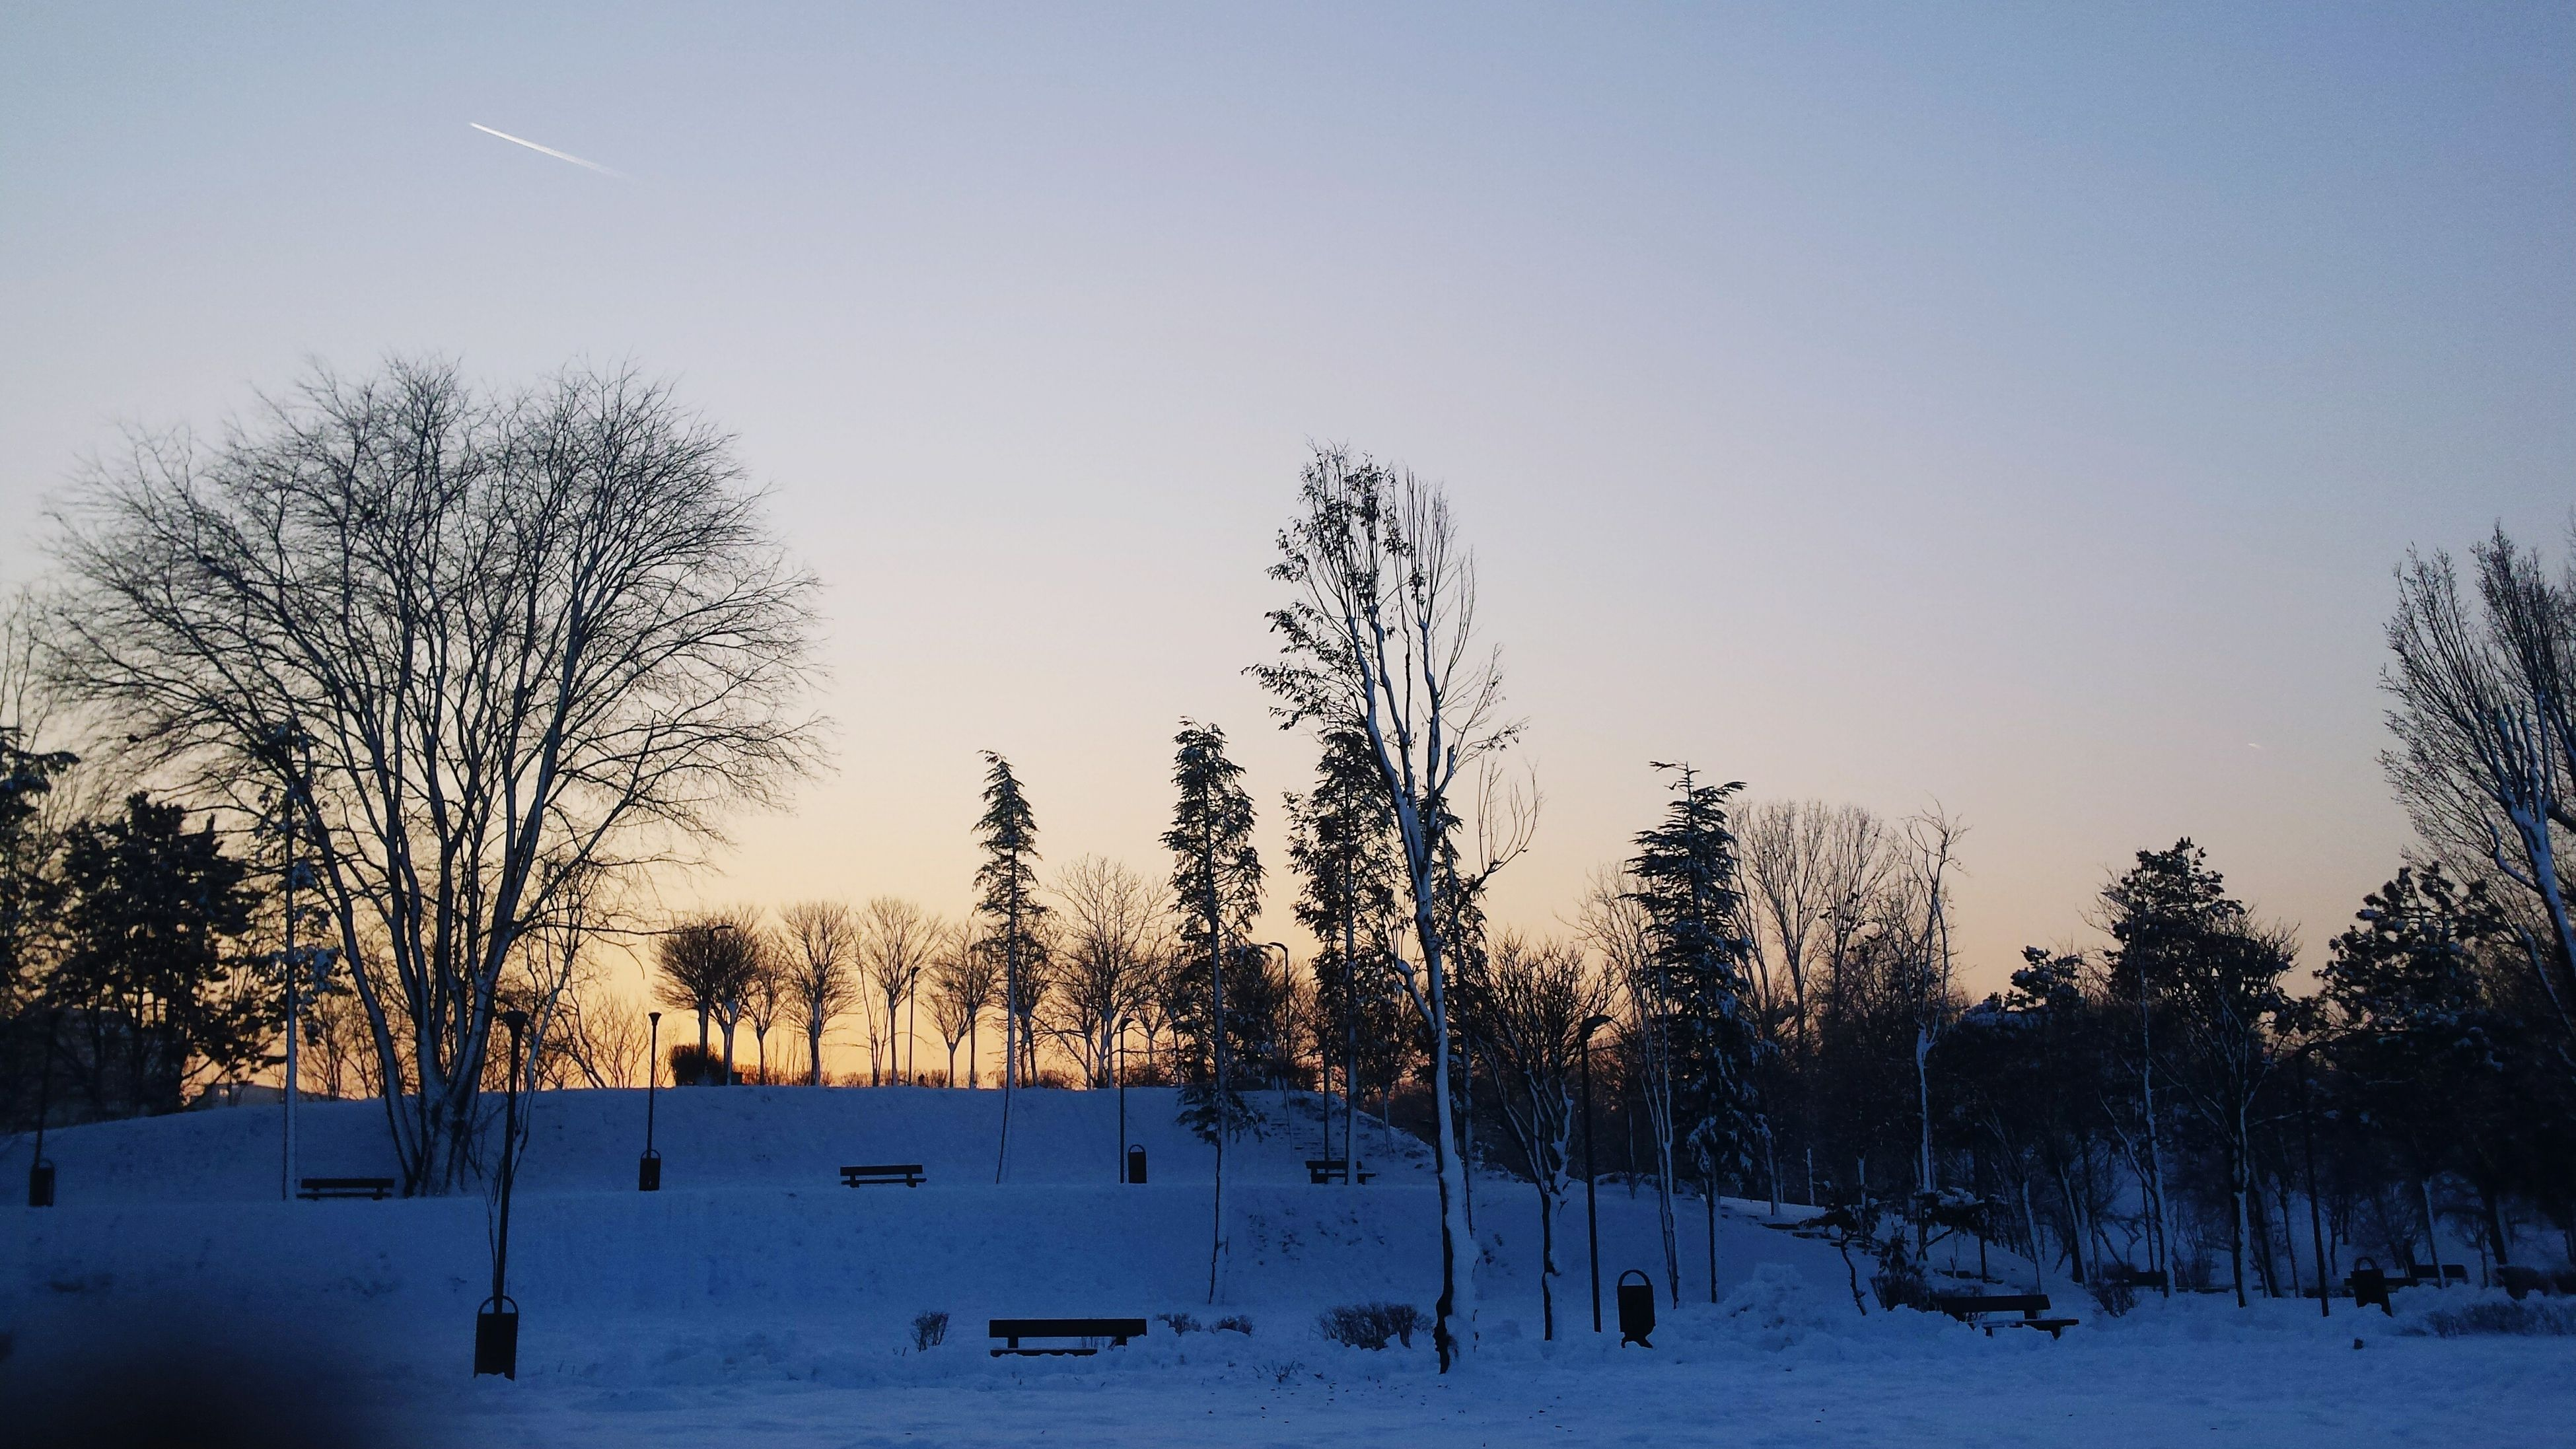 snow, winter, cold temperature, tree, clear sky, bare tree, tranquility, tranquil scene, season, beauty in nature, scenics, nature, landscape, copy space, weather, field, covering, silhouette, non-urban scene, branch